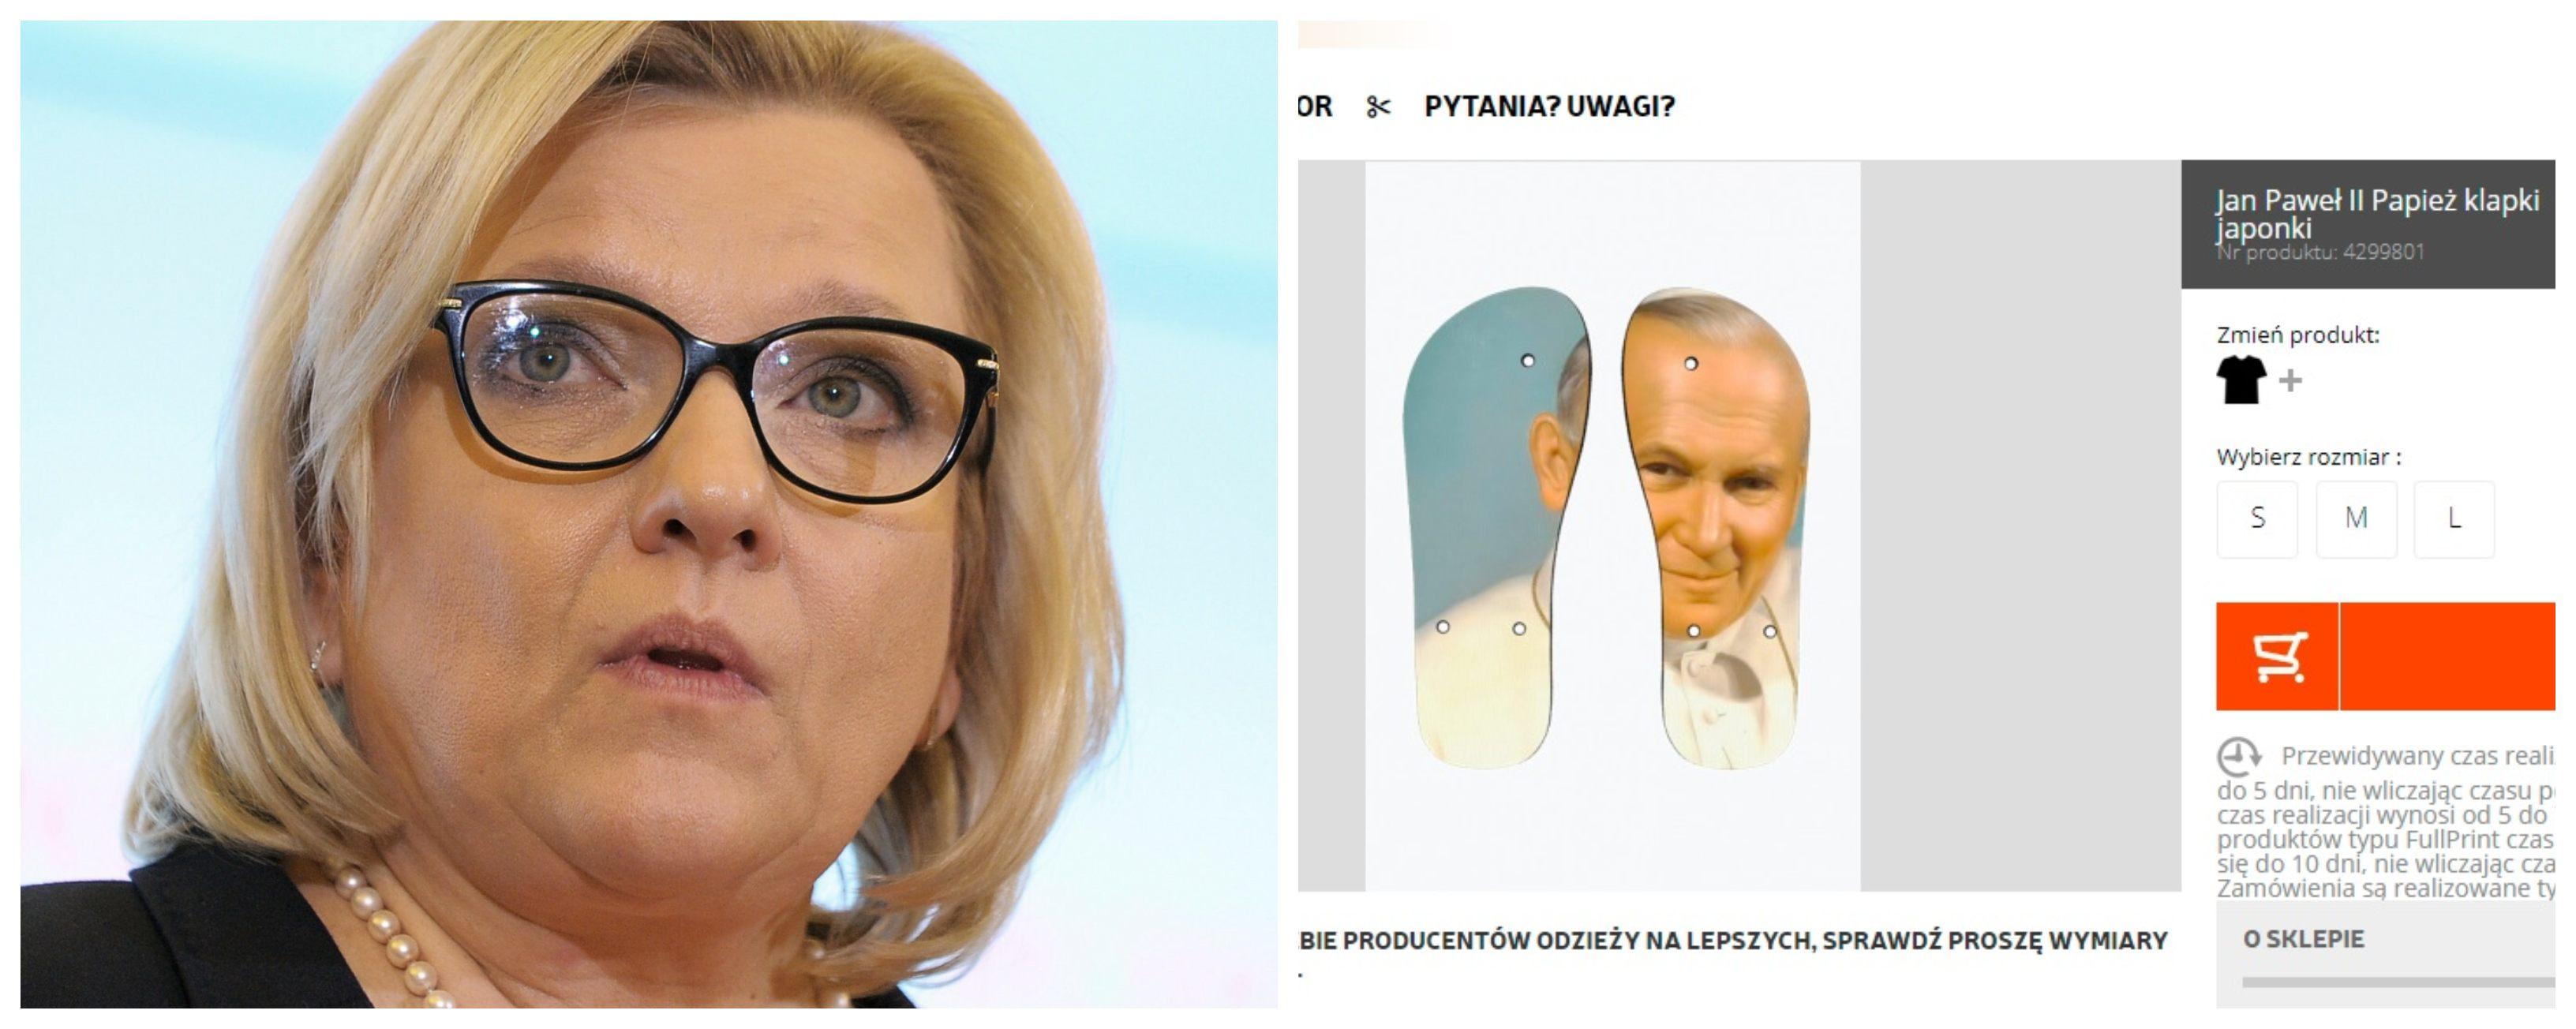 Beata Kempa i klapki